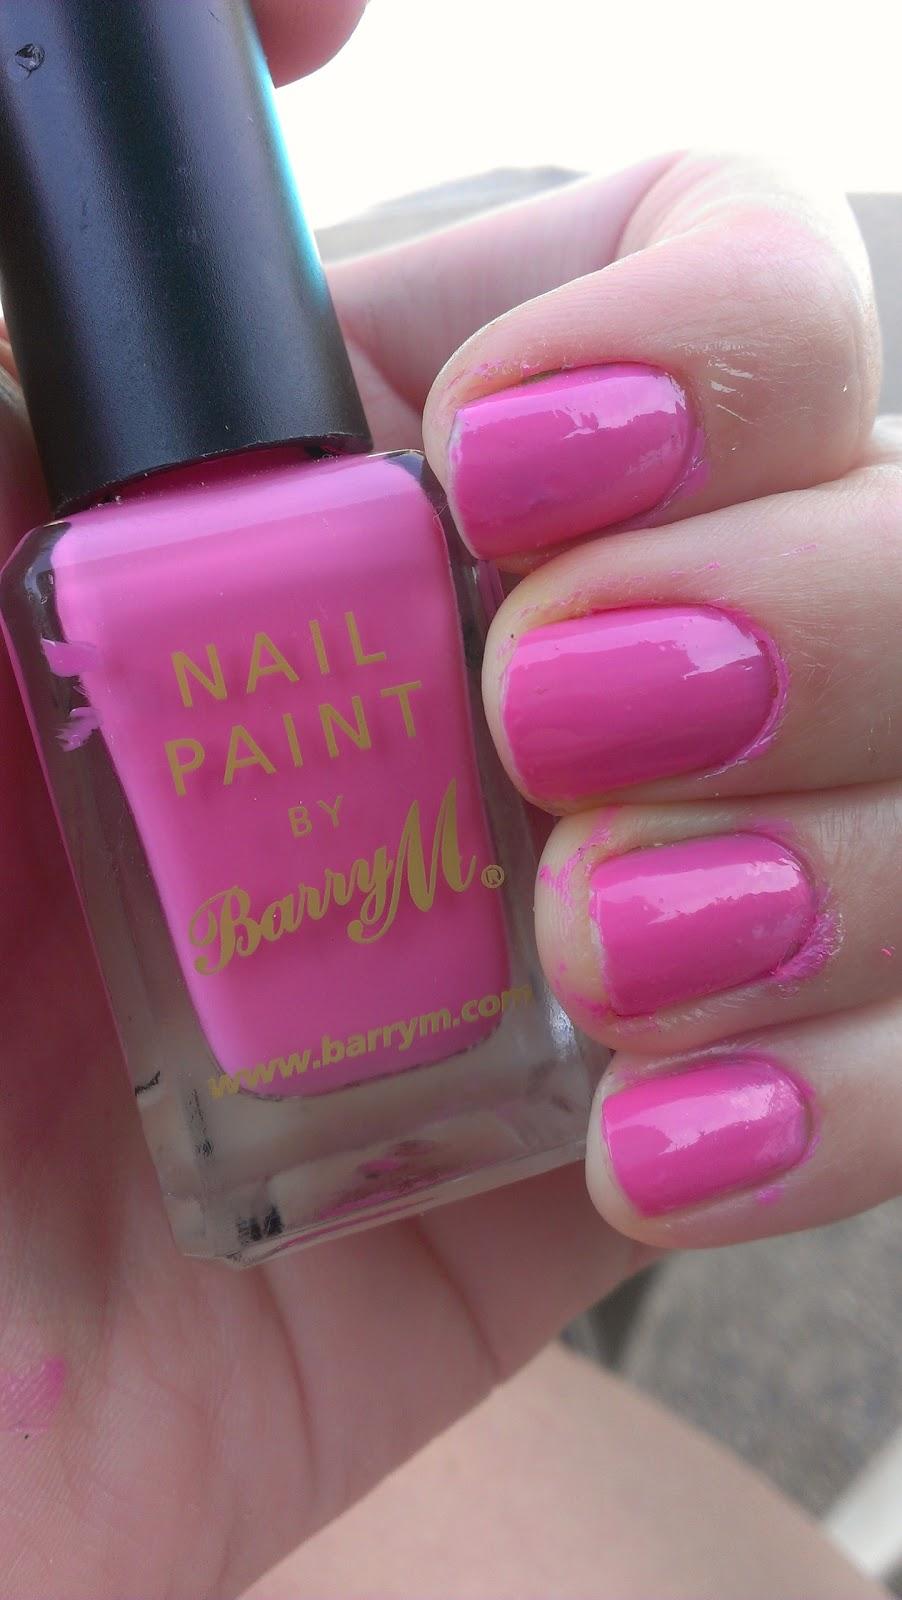 OPI Nothin' Mousie 'bout it, OPI polish, polish swatch, MUA polish, MUS 279 bright pink swatch